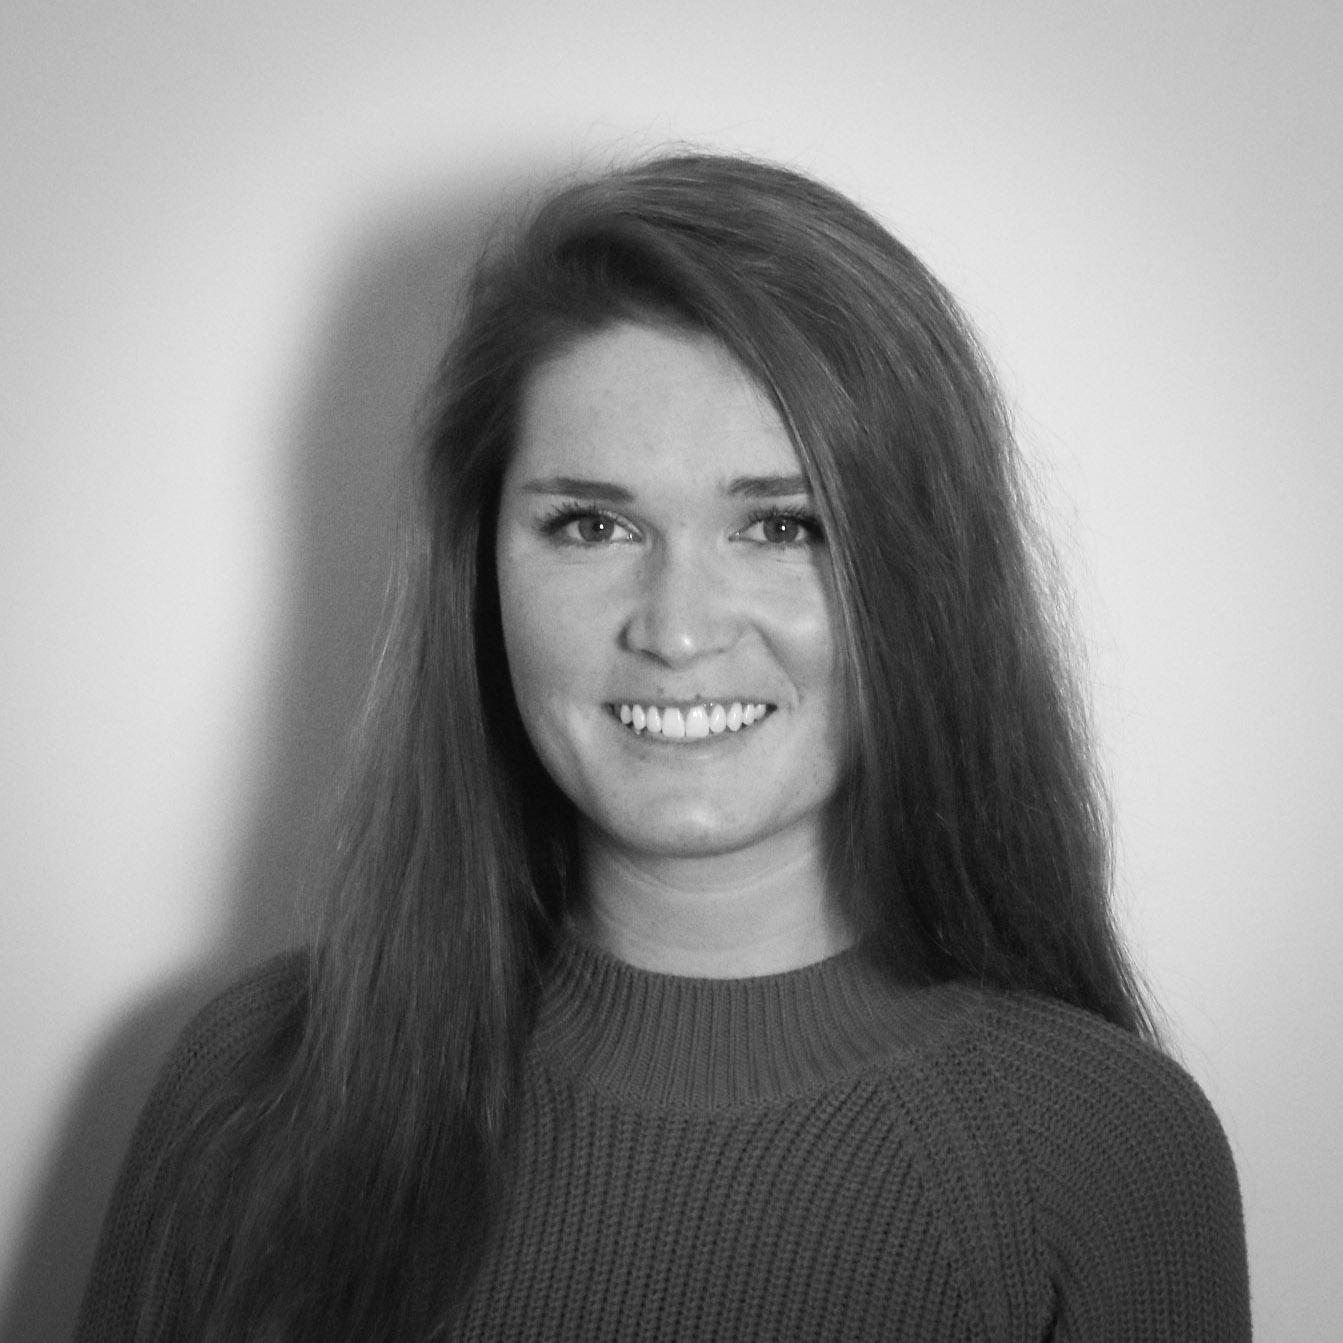 Lauren Rae - Head of Sponsorship